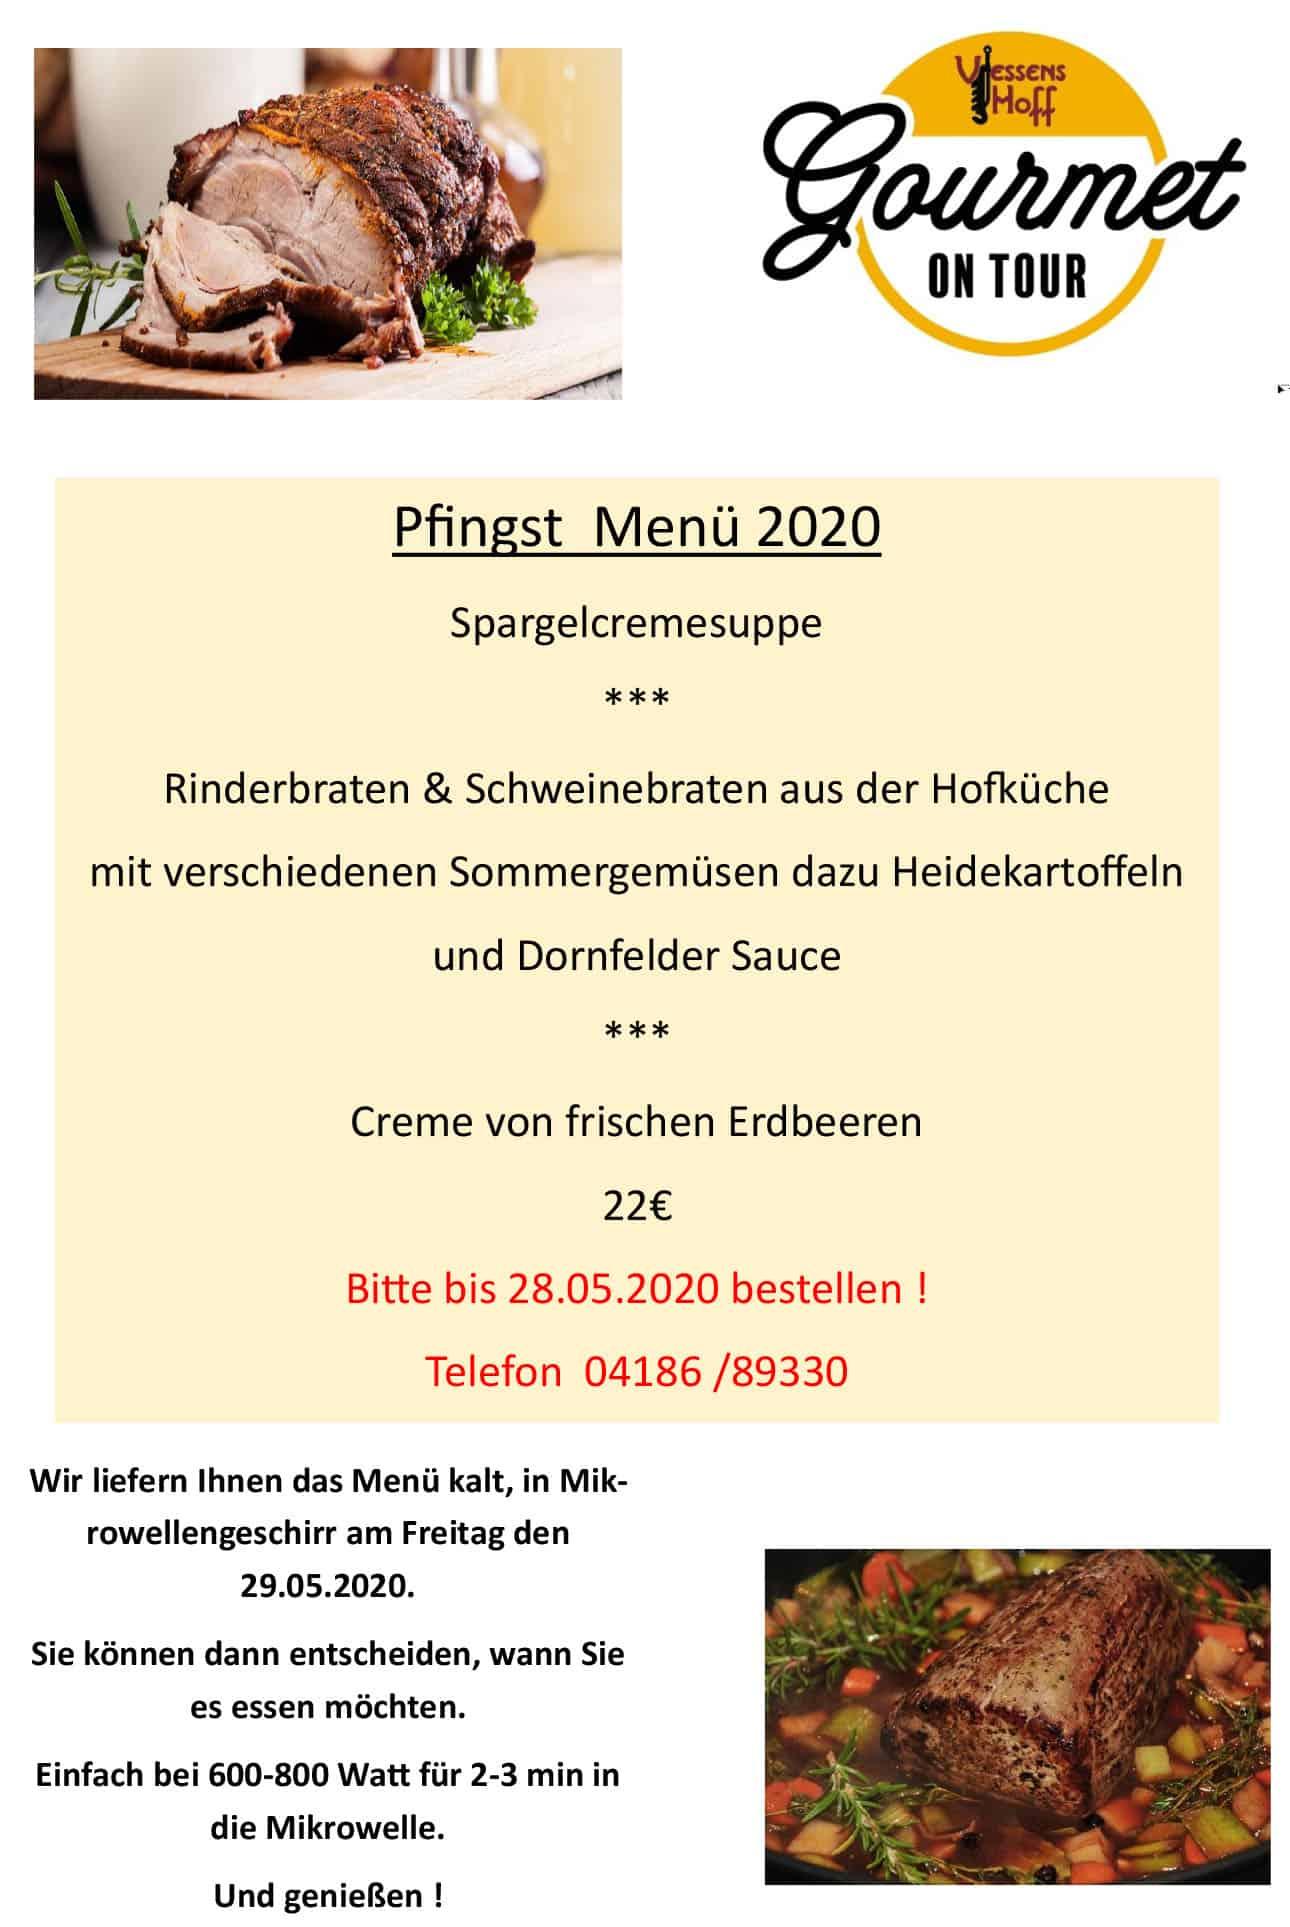 Pfingst Menü - Gourmet on Tour